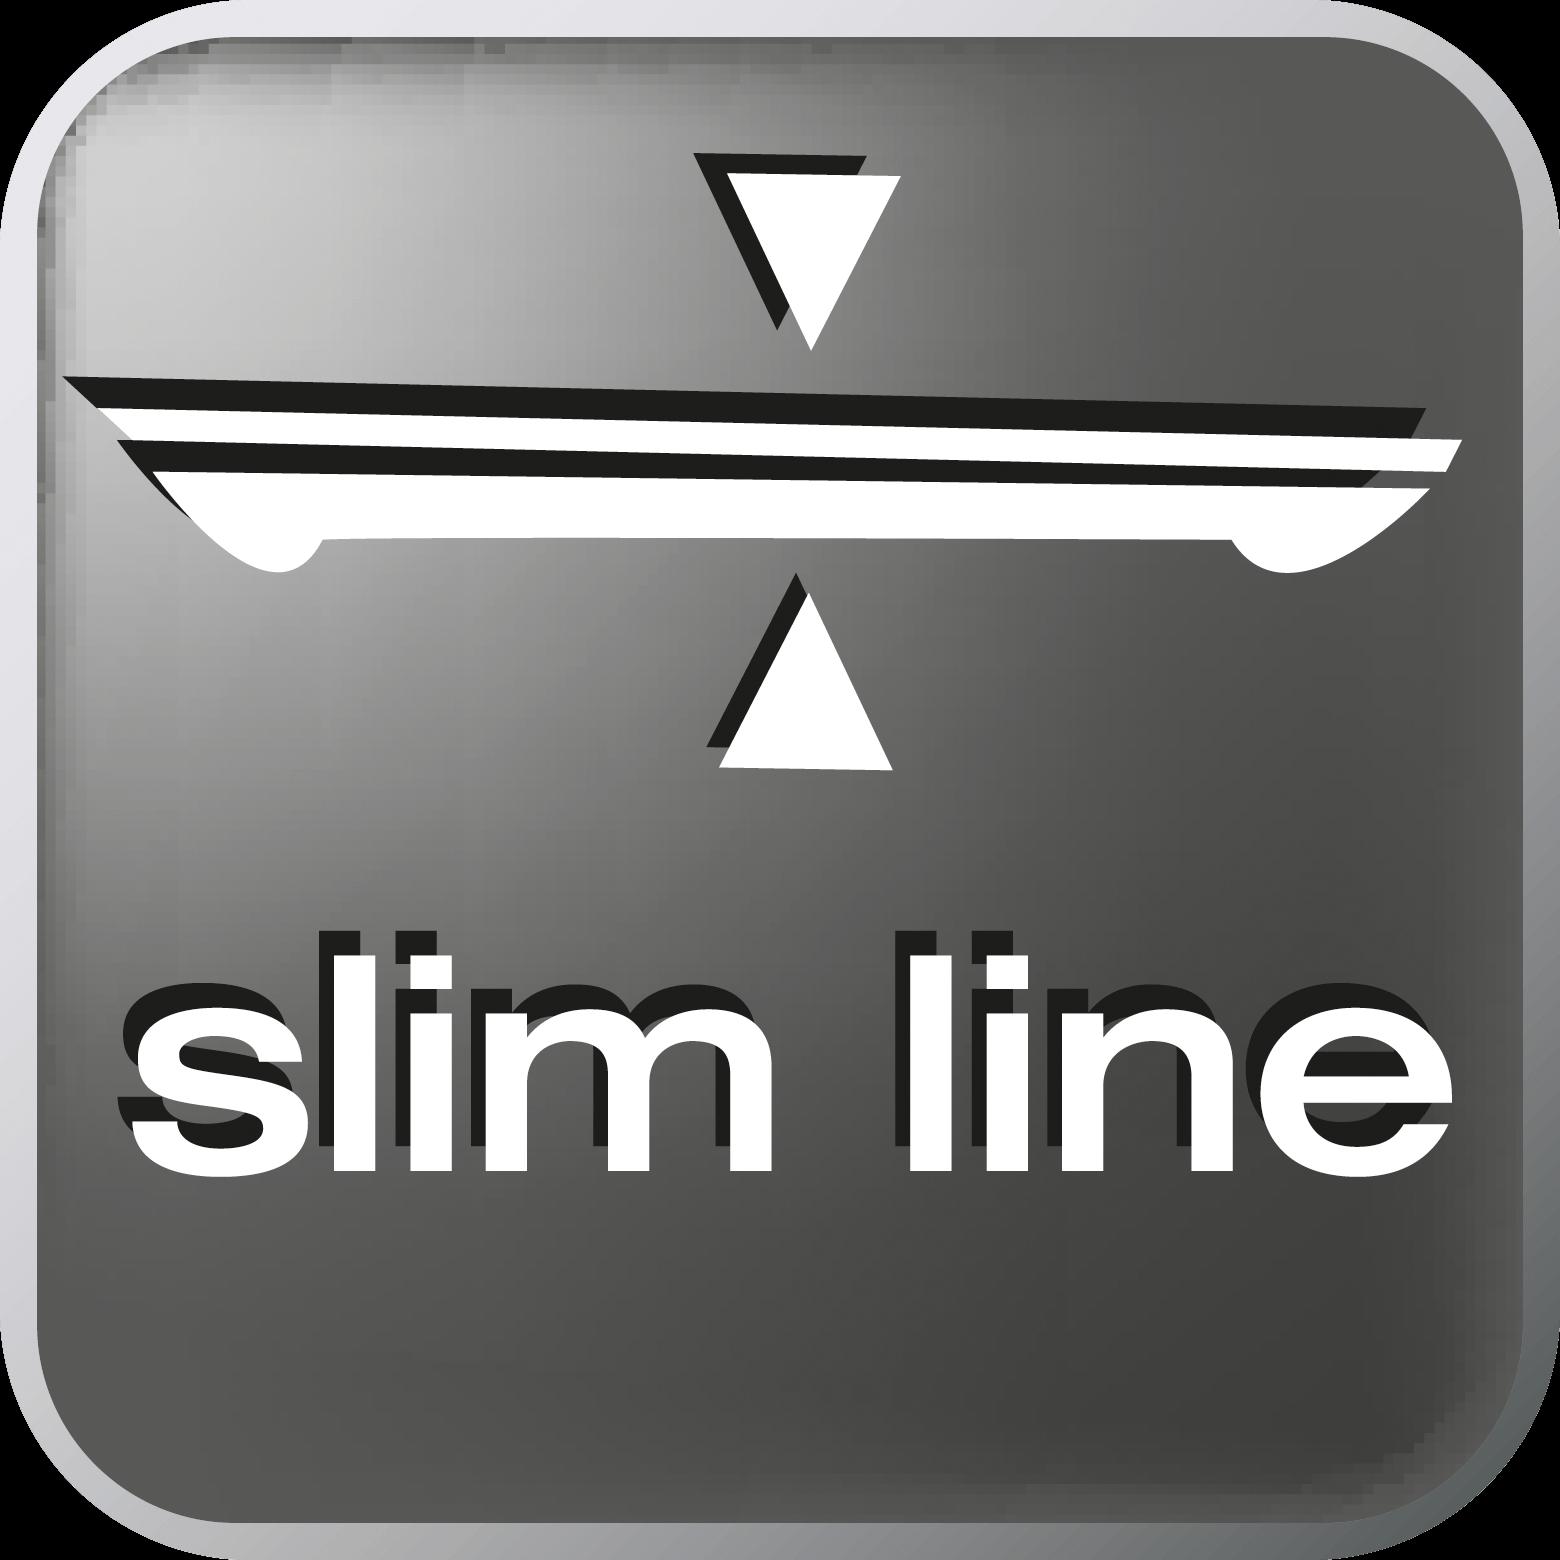 https://cdn-reichelt.de/bilder/web/xxl_ws/D400/WENT_SLIM-LINE.png